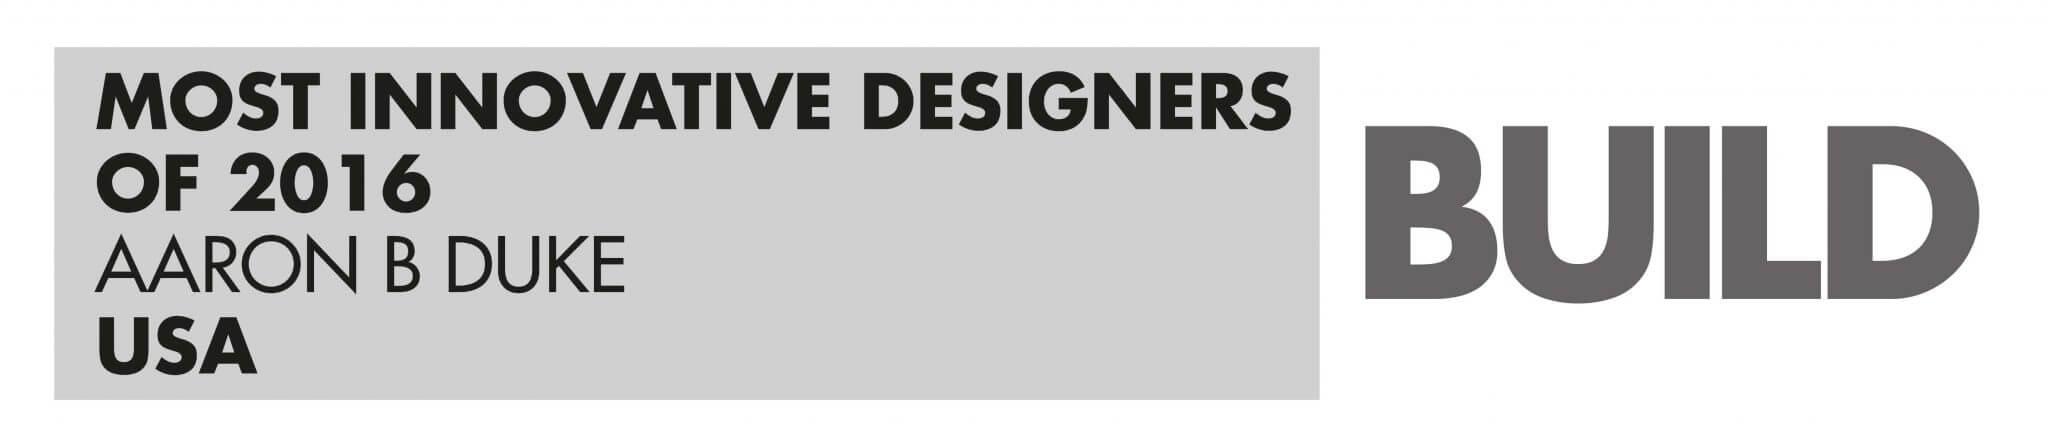 Most Innovative Designers of 2016 - AARONBDUKE